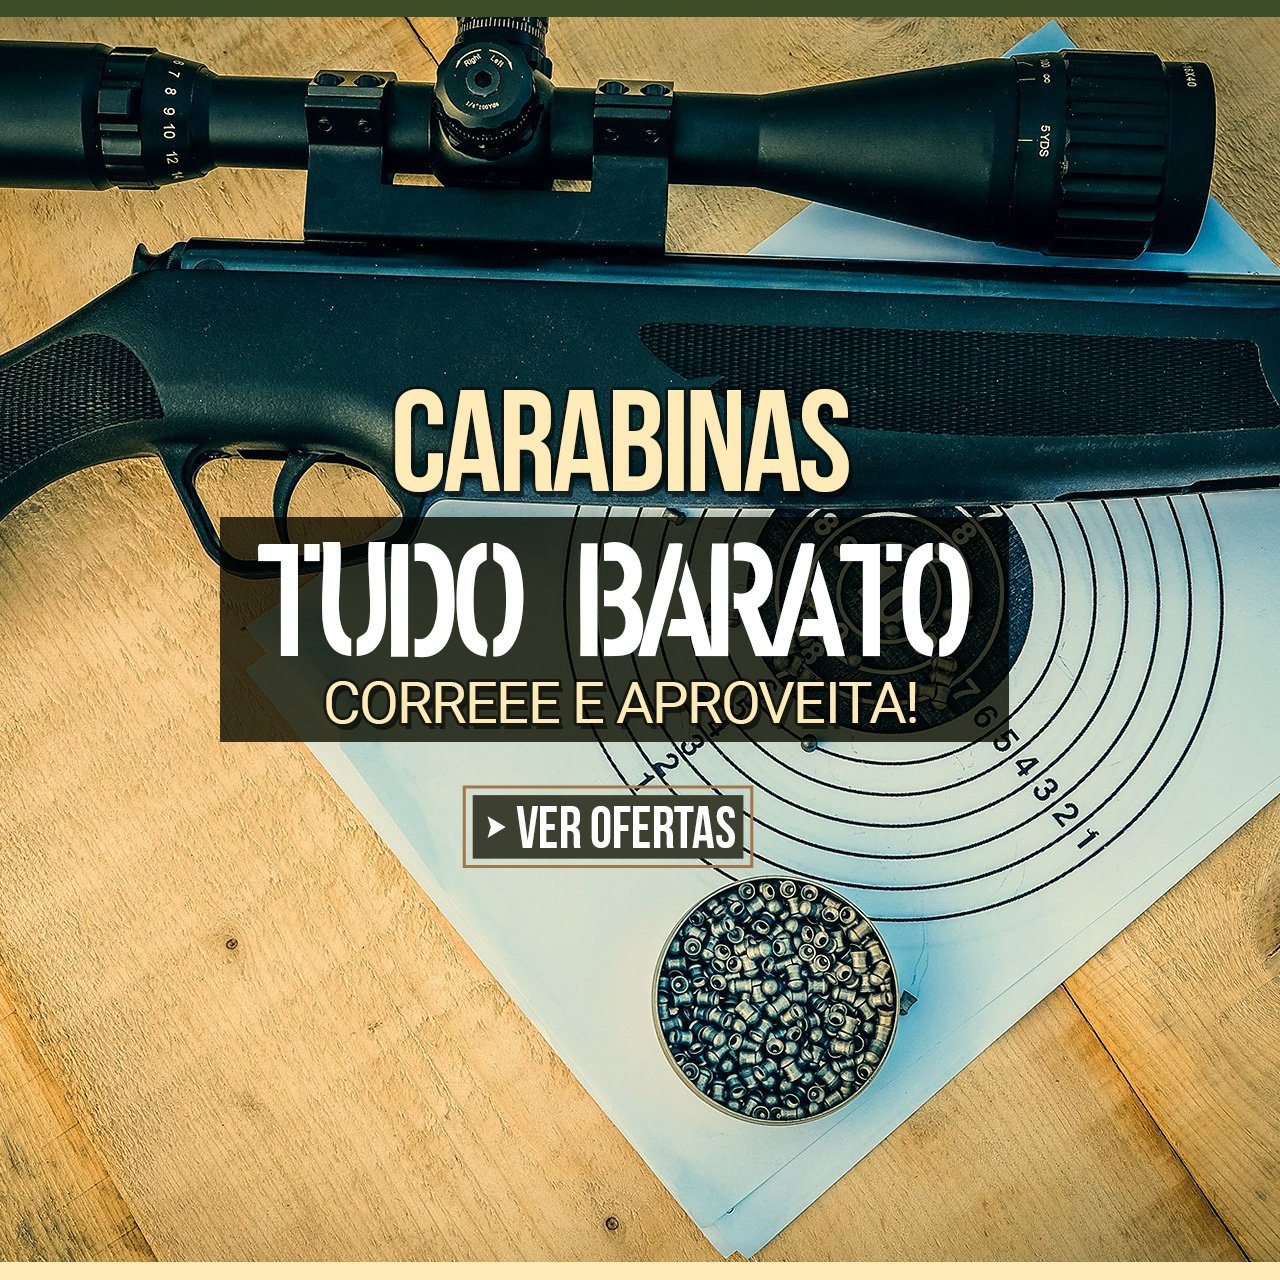 CARABINAS - TUDO BARATOOO, CORREEE E APROVEITA!